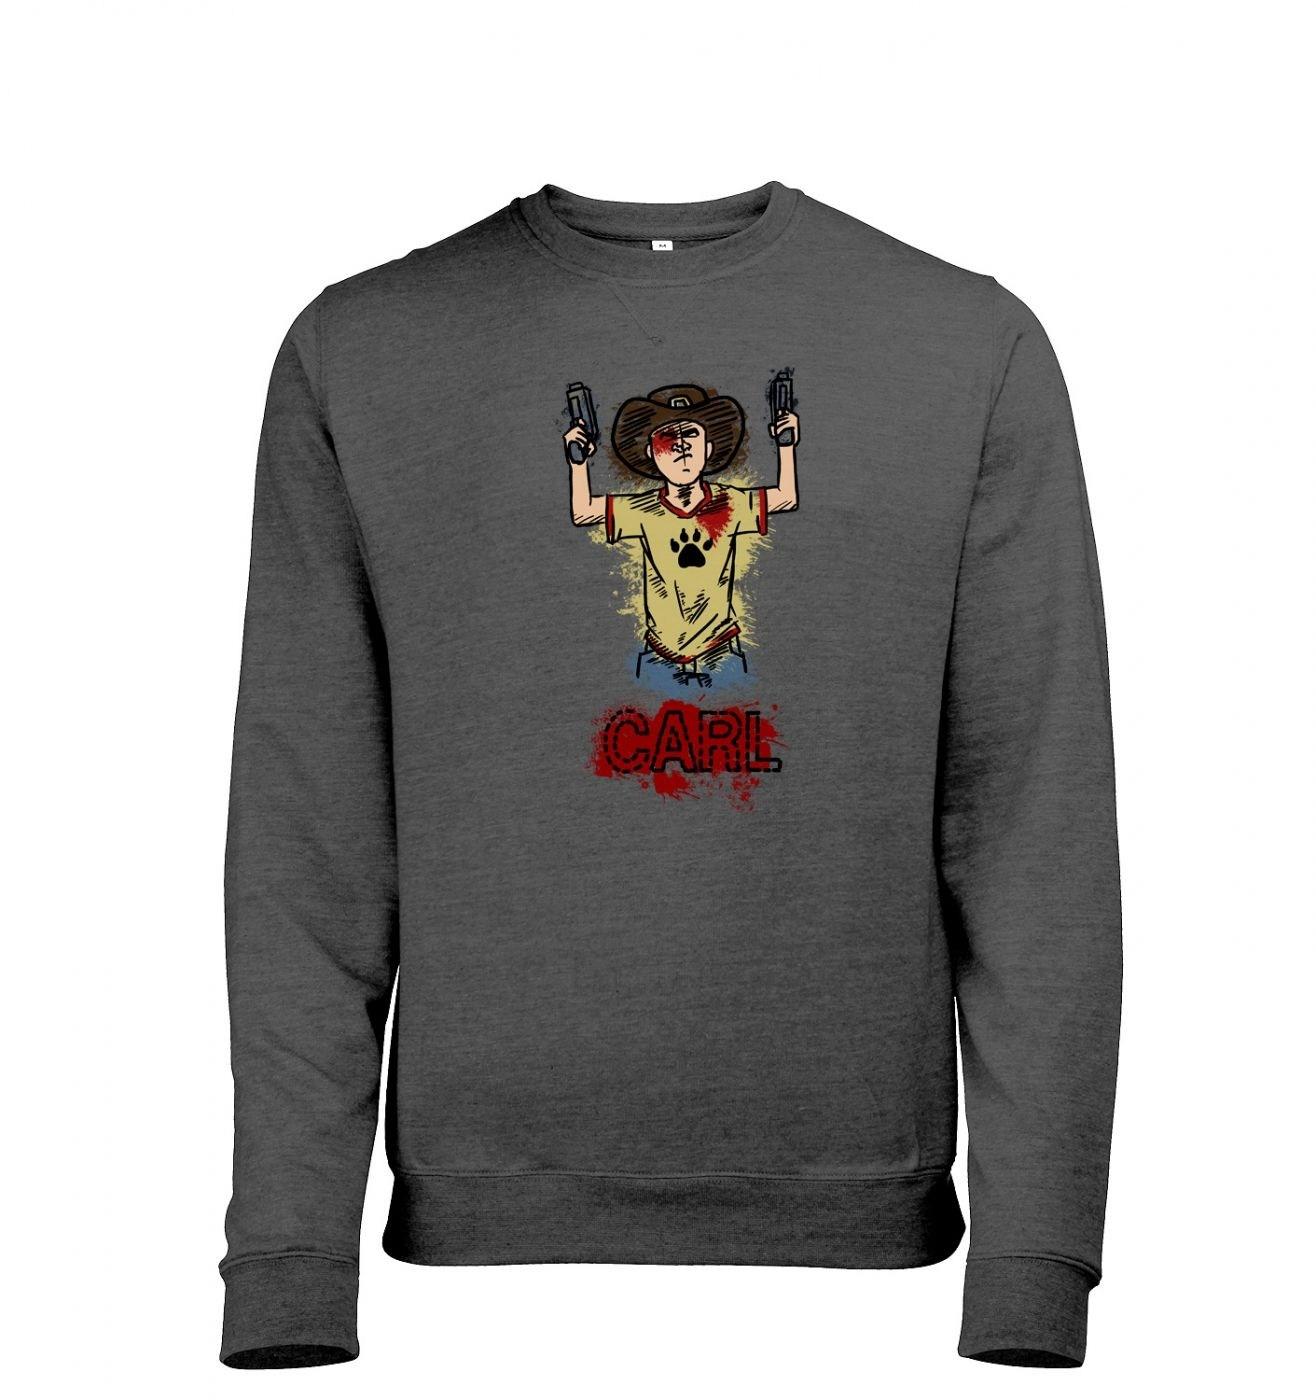 Kid with guns men's heather sweatshirt